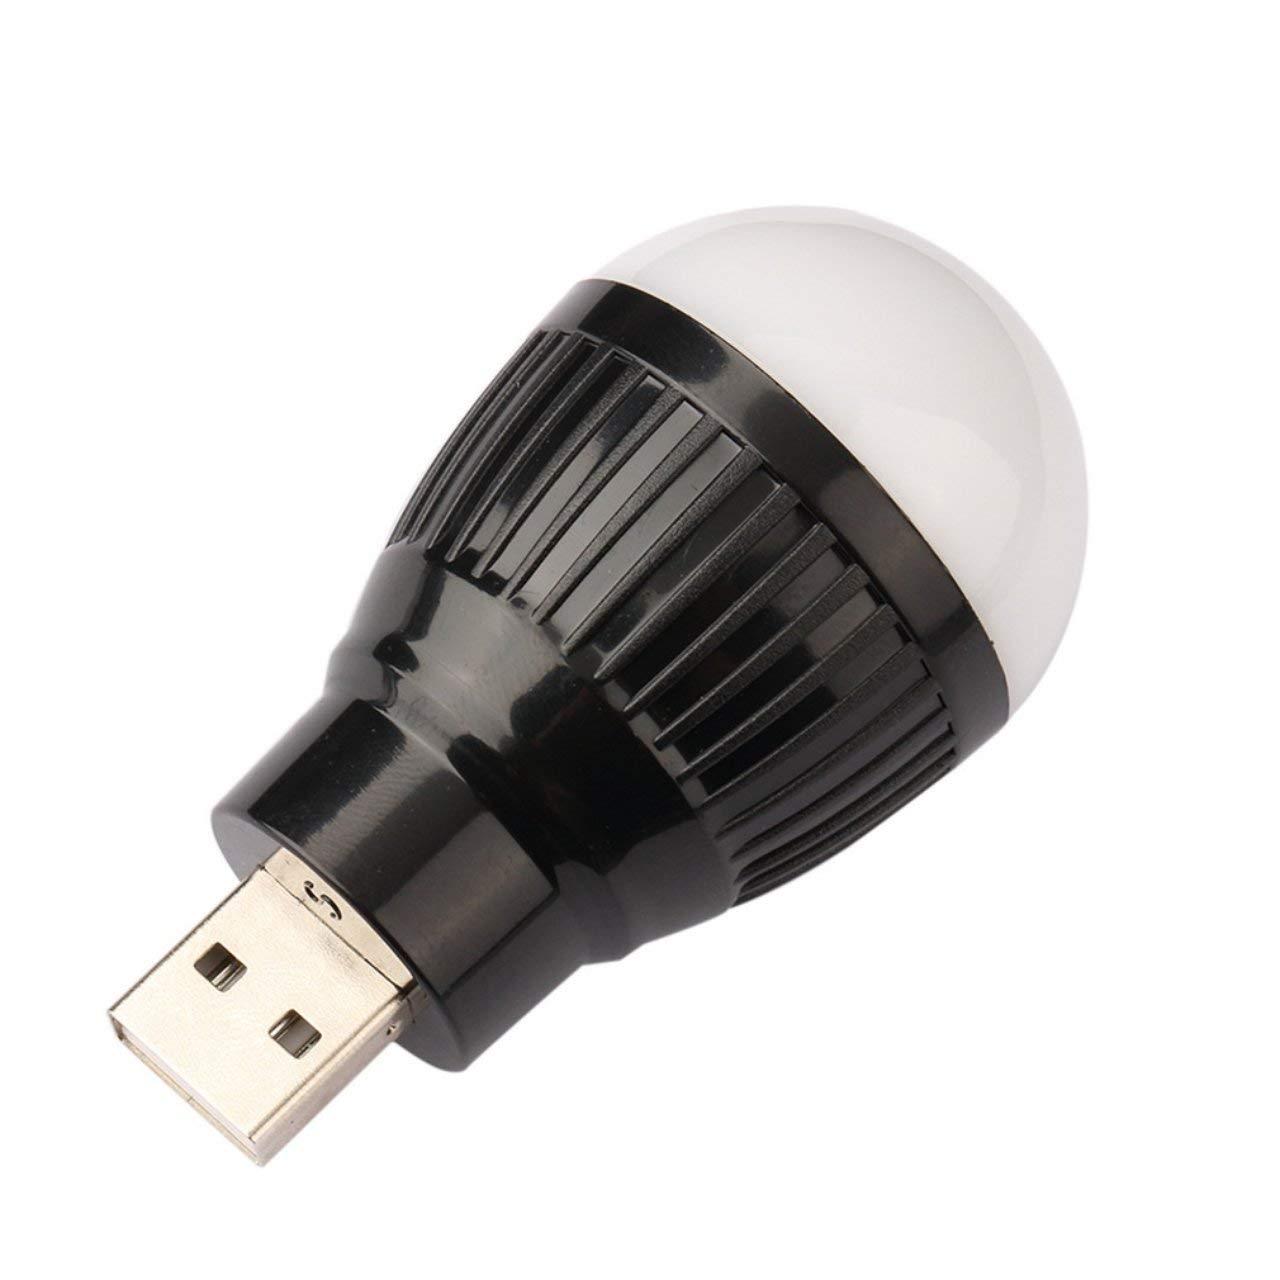 Portable Small and Lightweight Energy Saving Durable Mini USB LED Light Lamp Bulb For Computer Laptop PC Desk Reading Jasnyfall black